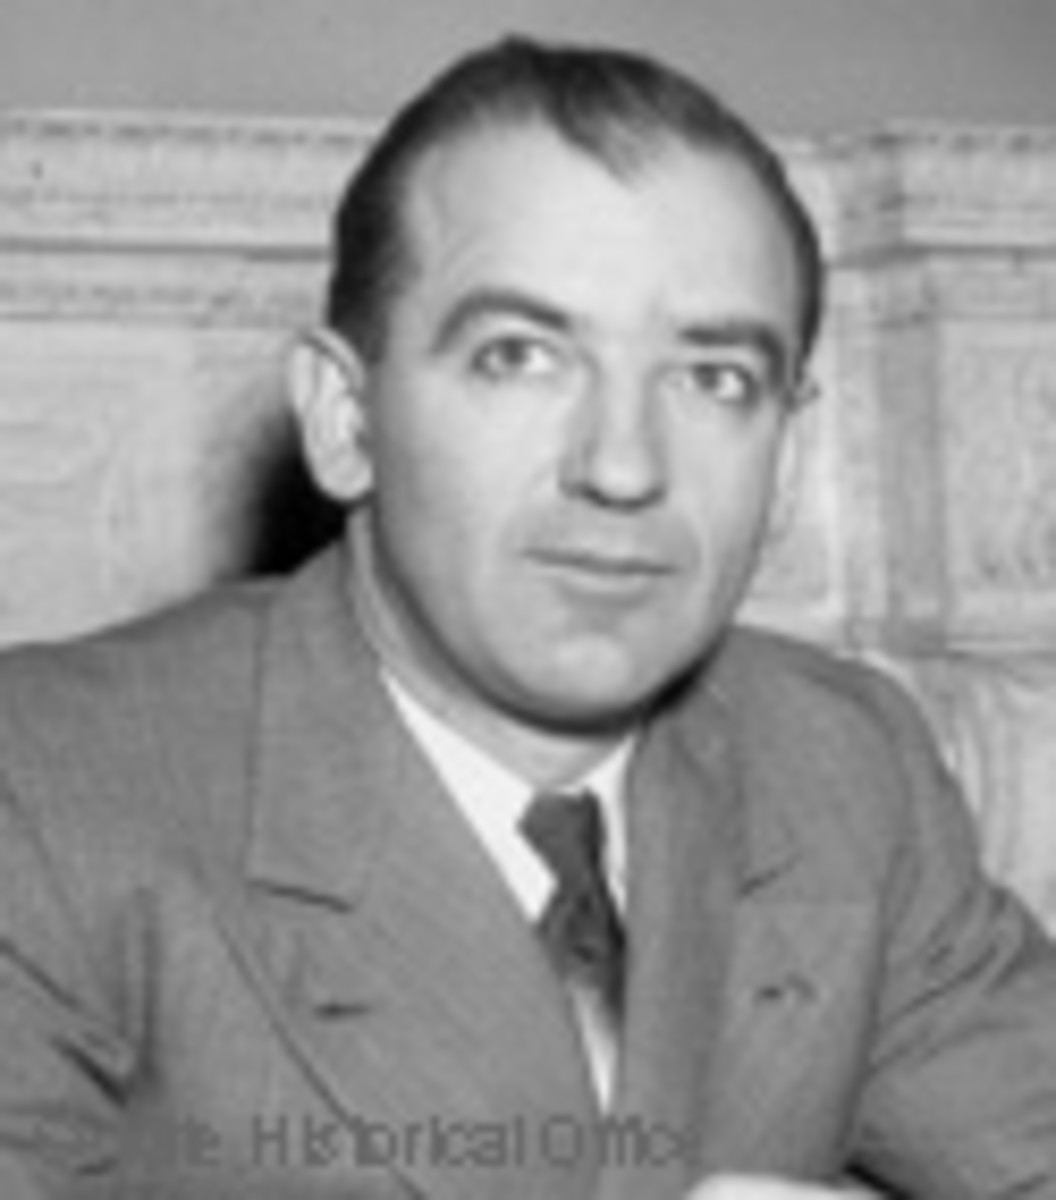 Senator Joseph McCarthy (R-WI)